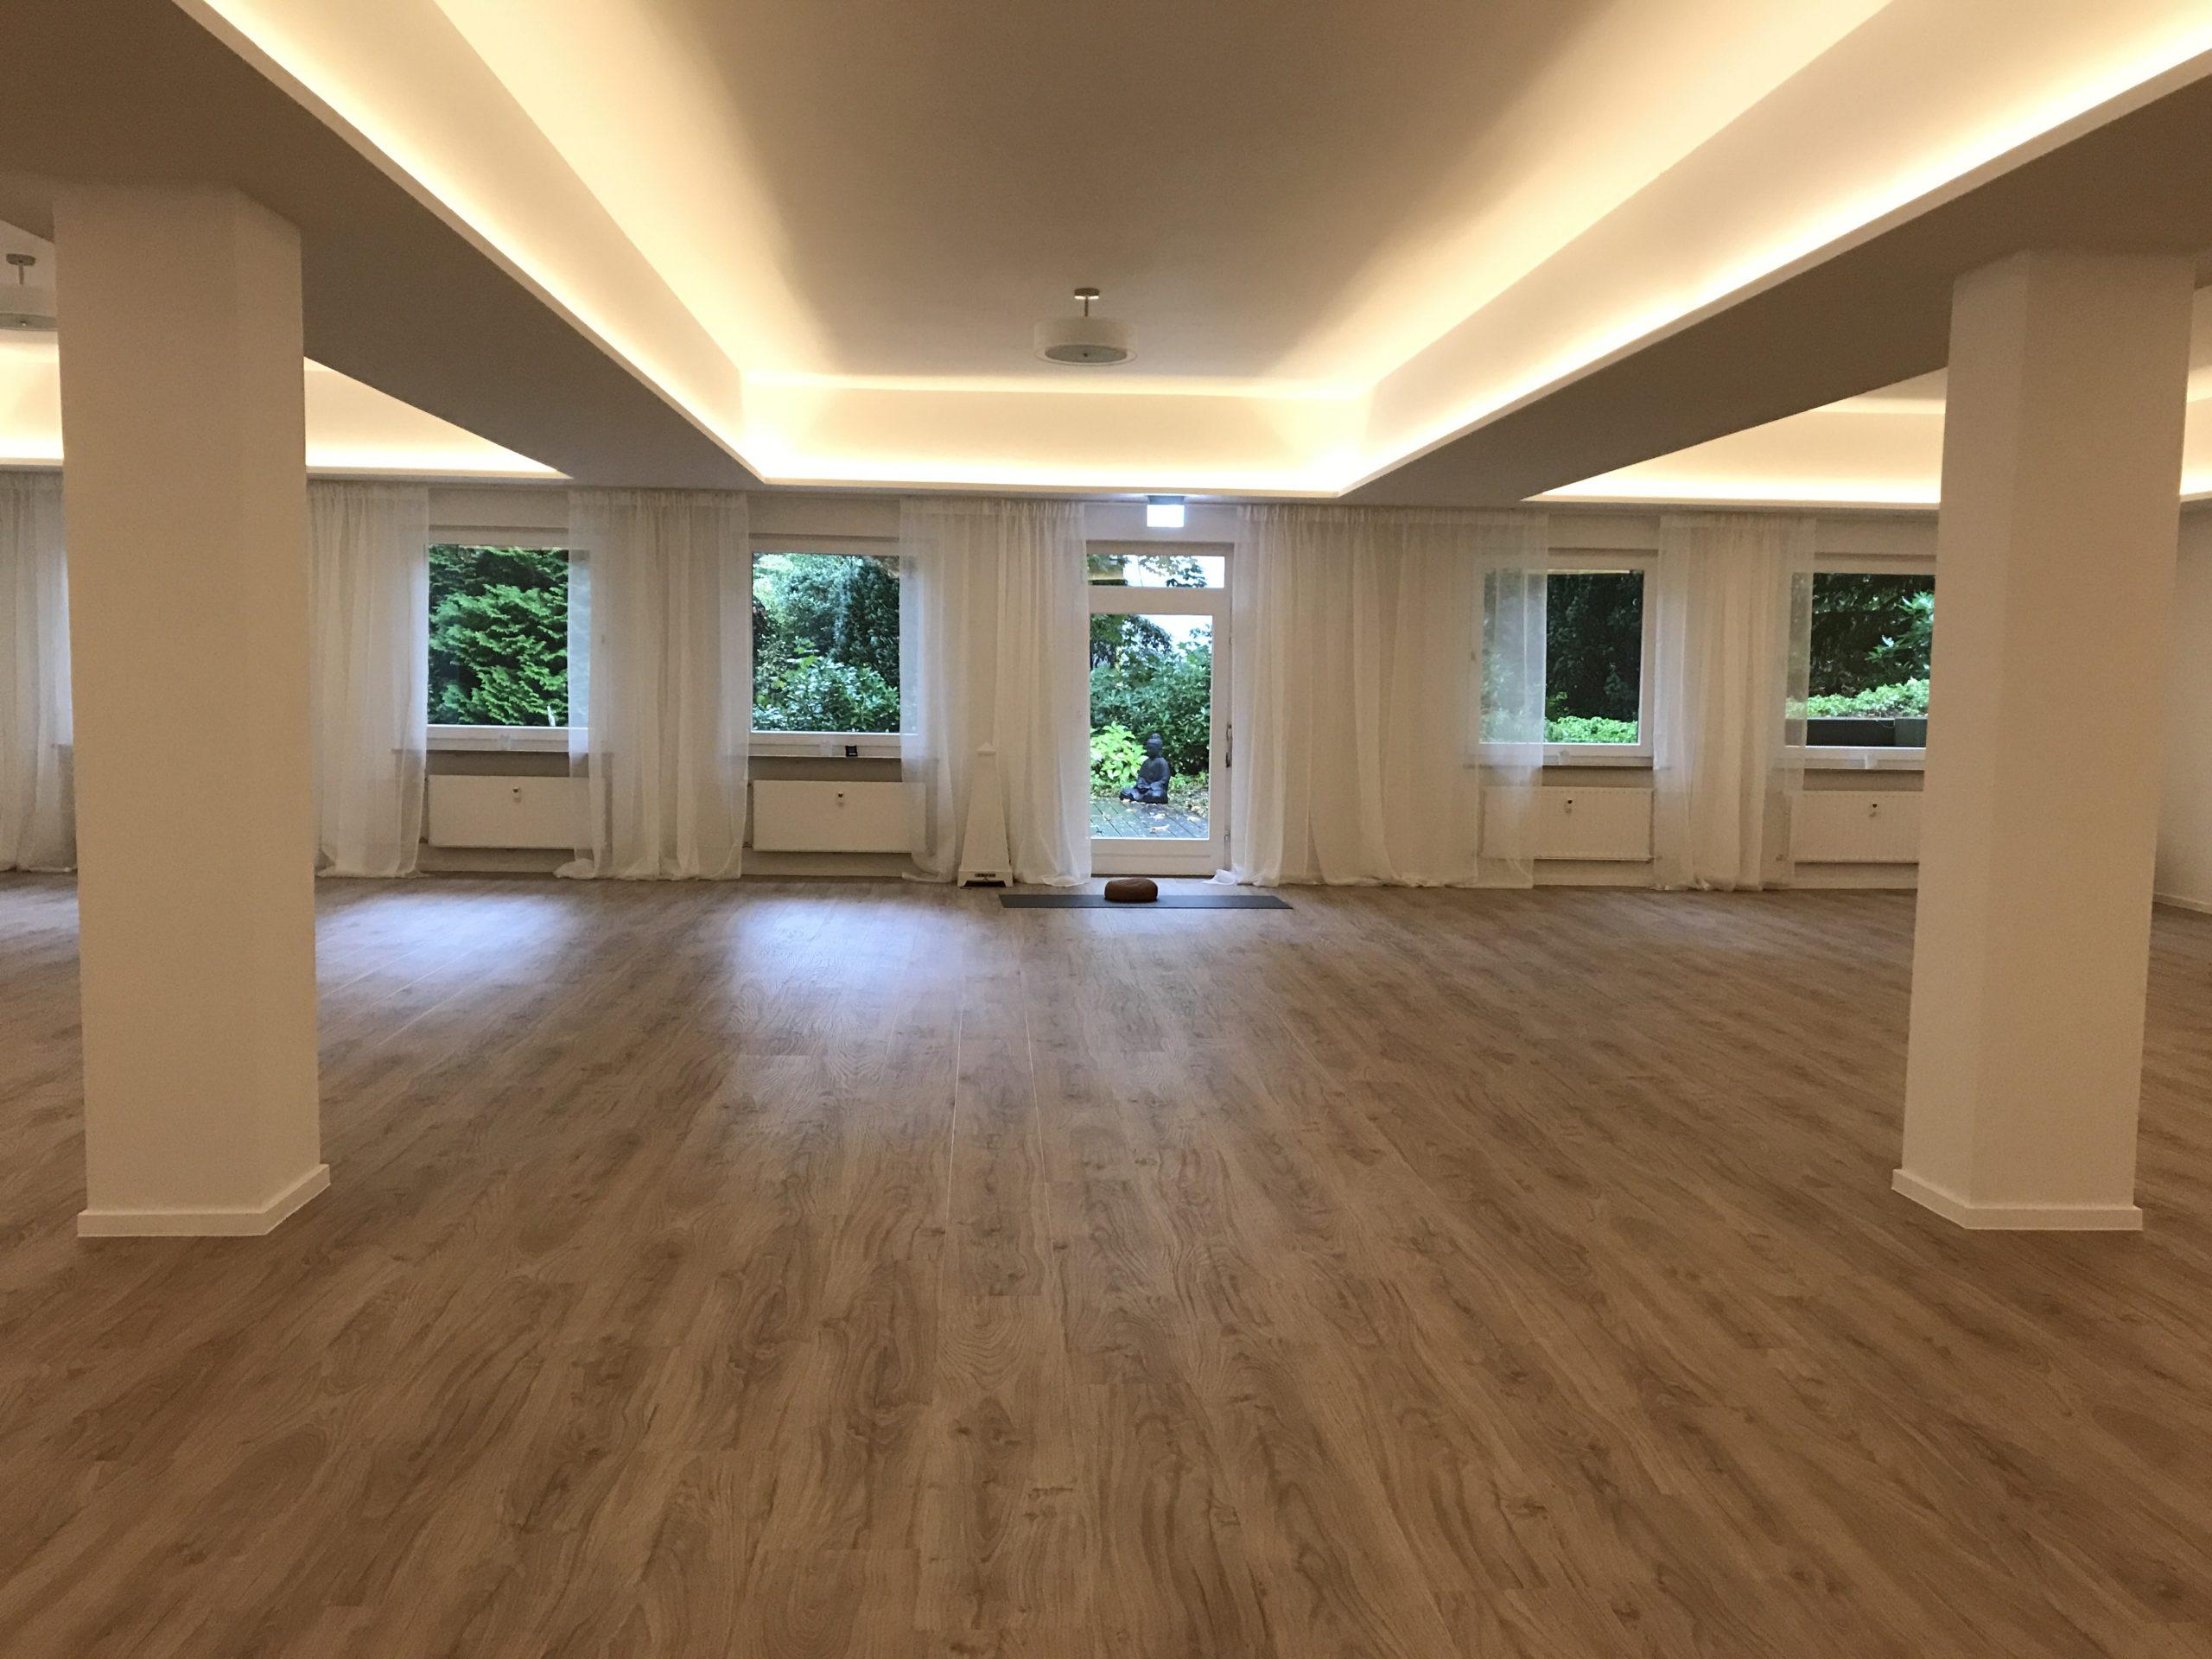 Unit Yoga Hamburg grosser Kursraum